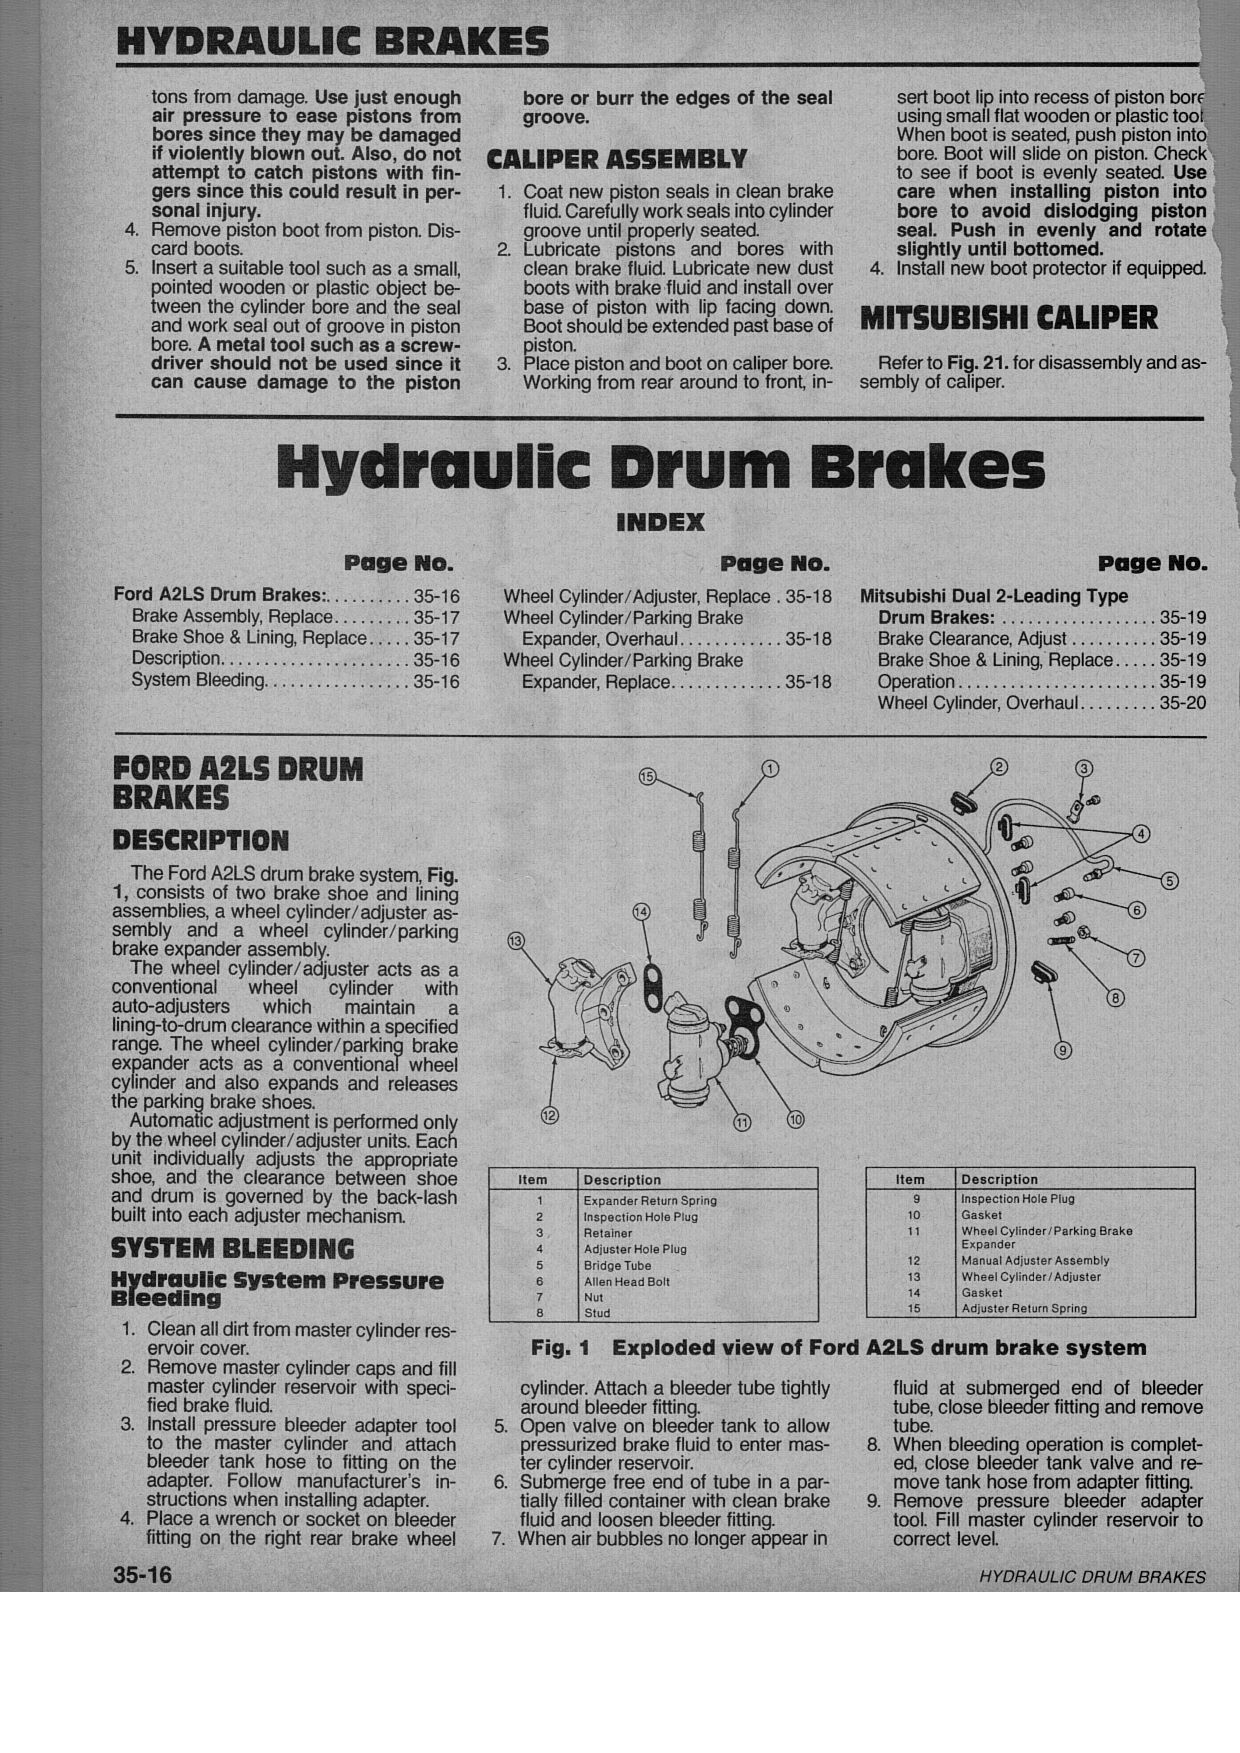 1987 ford F700 Brake System Diagram Diagram] ford F800 Brake Diagram Full Version Hd Quality Of 1987 ford F700 Brake System Diagram